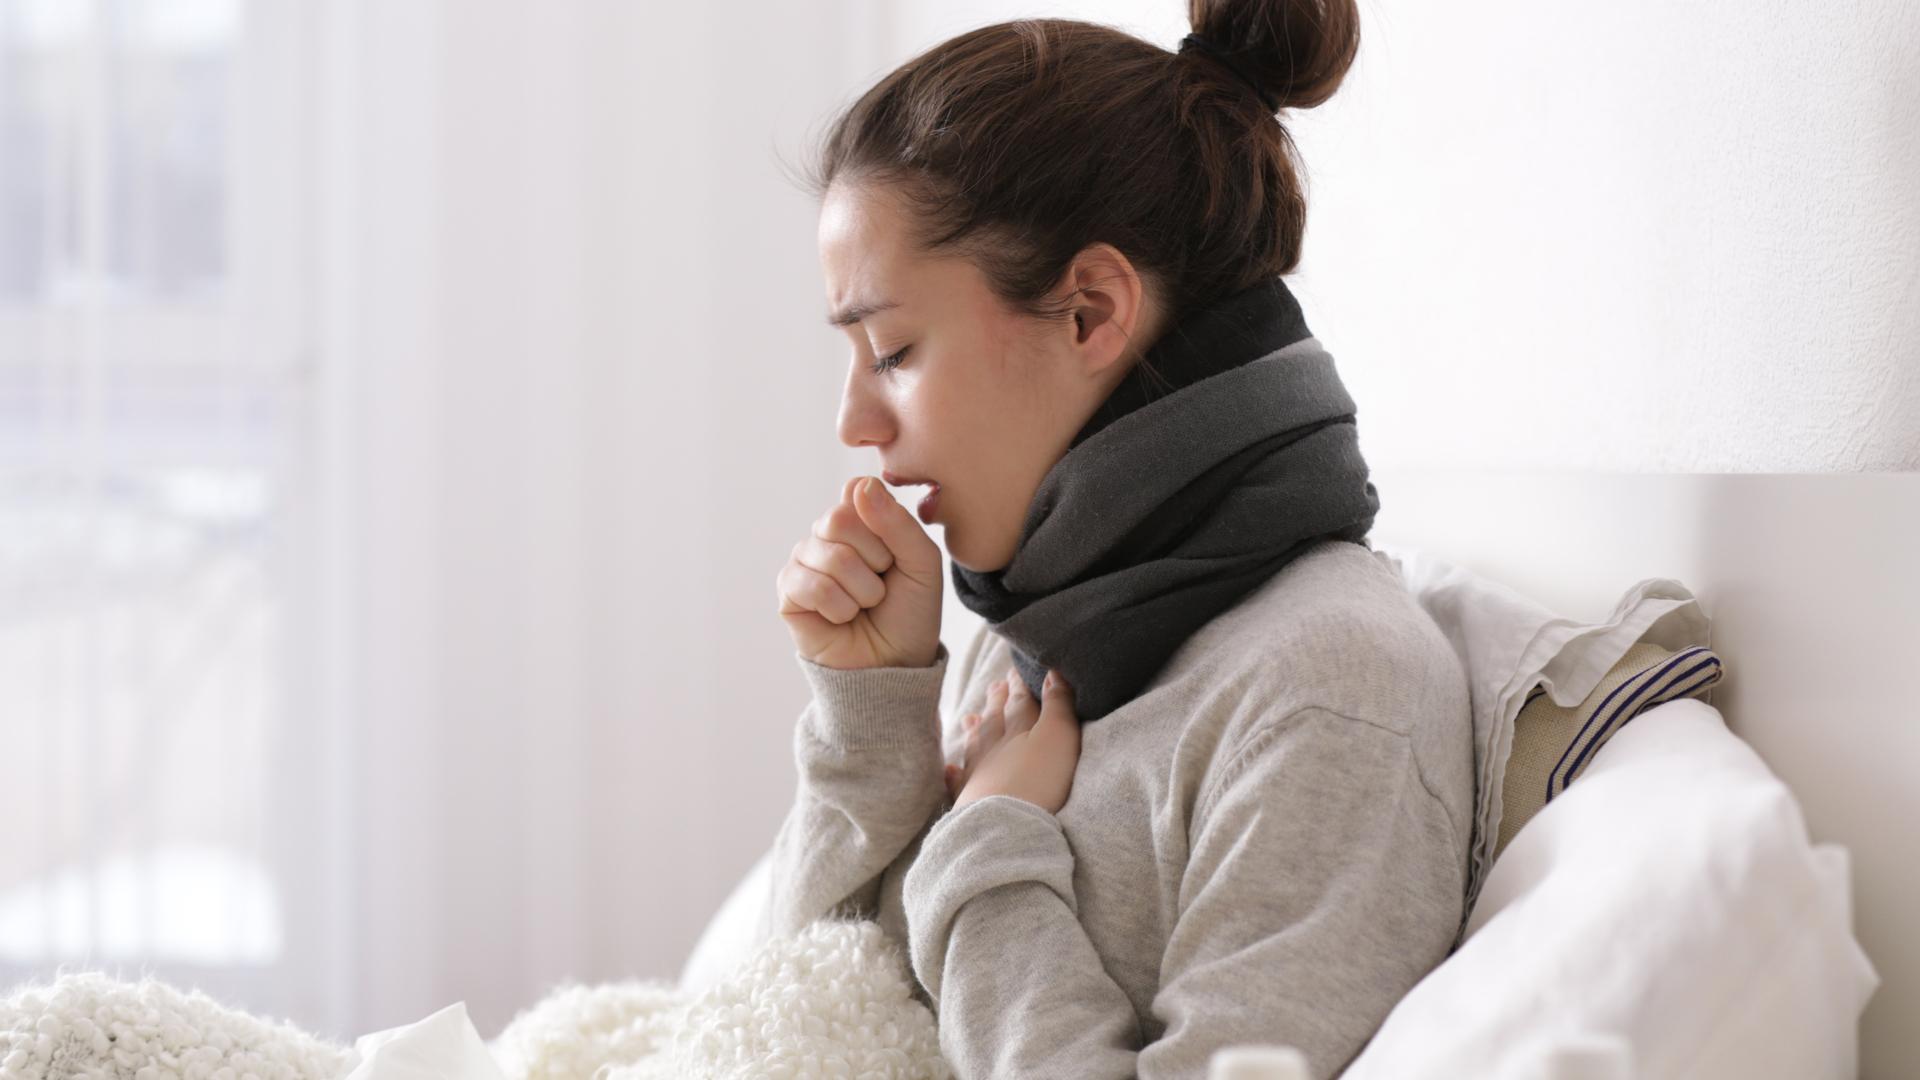 COVID-19: ¿Cómo se diferencia del resfriado común, la gripe o influenza?